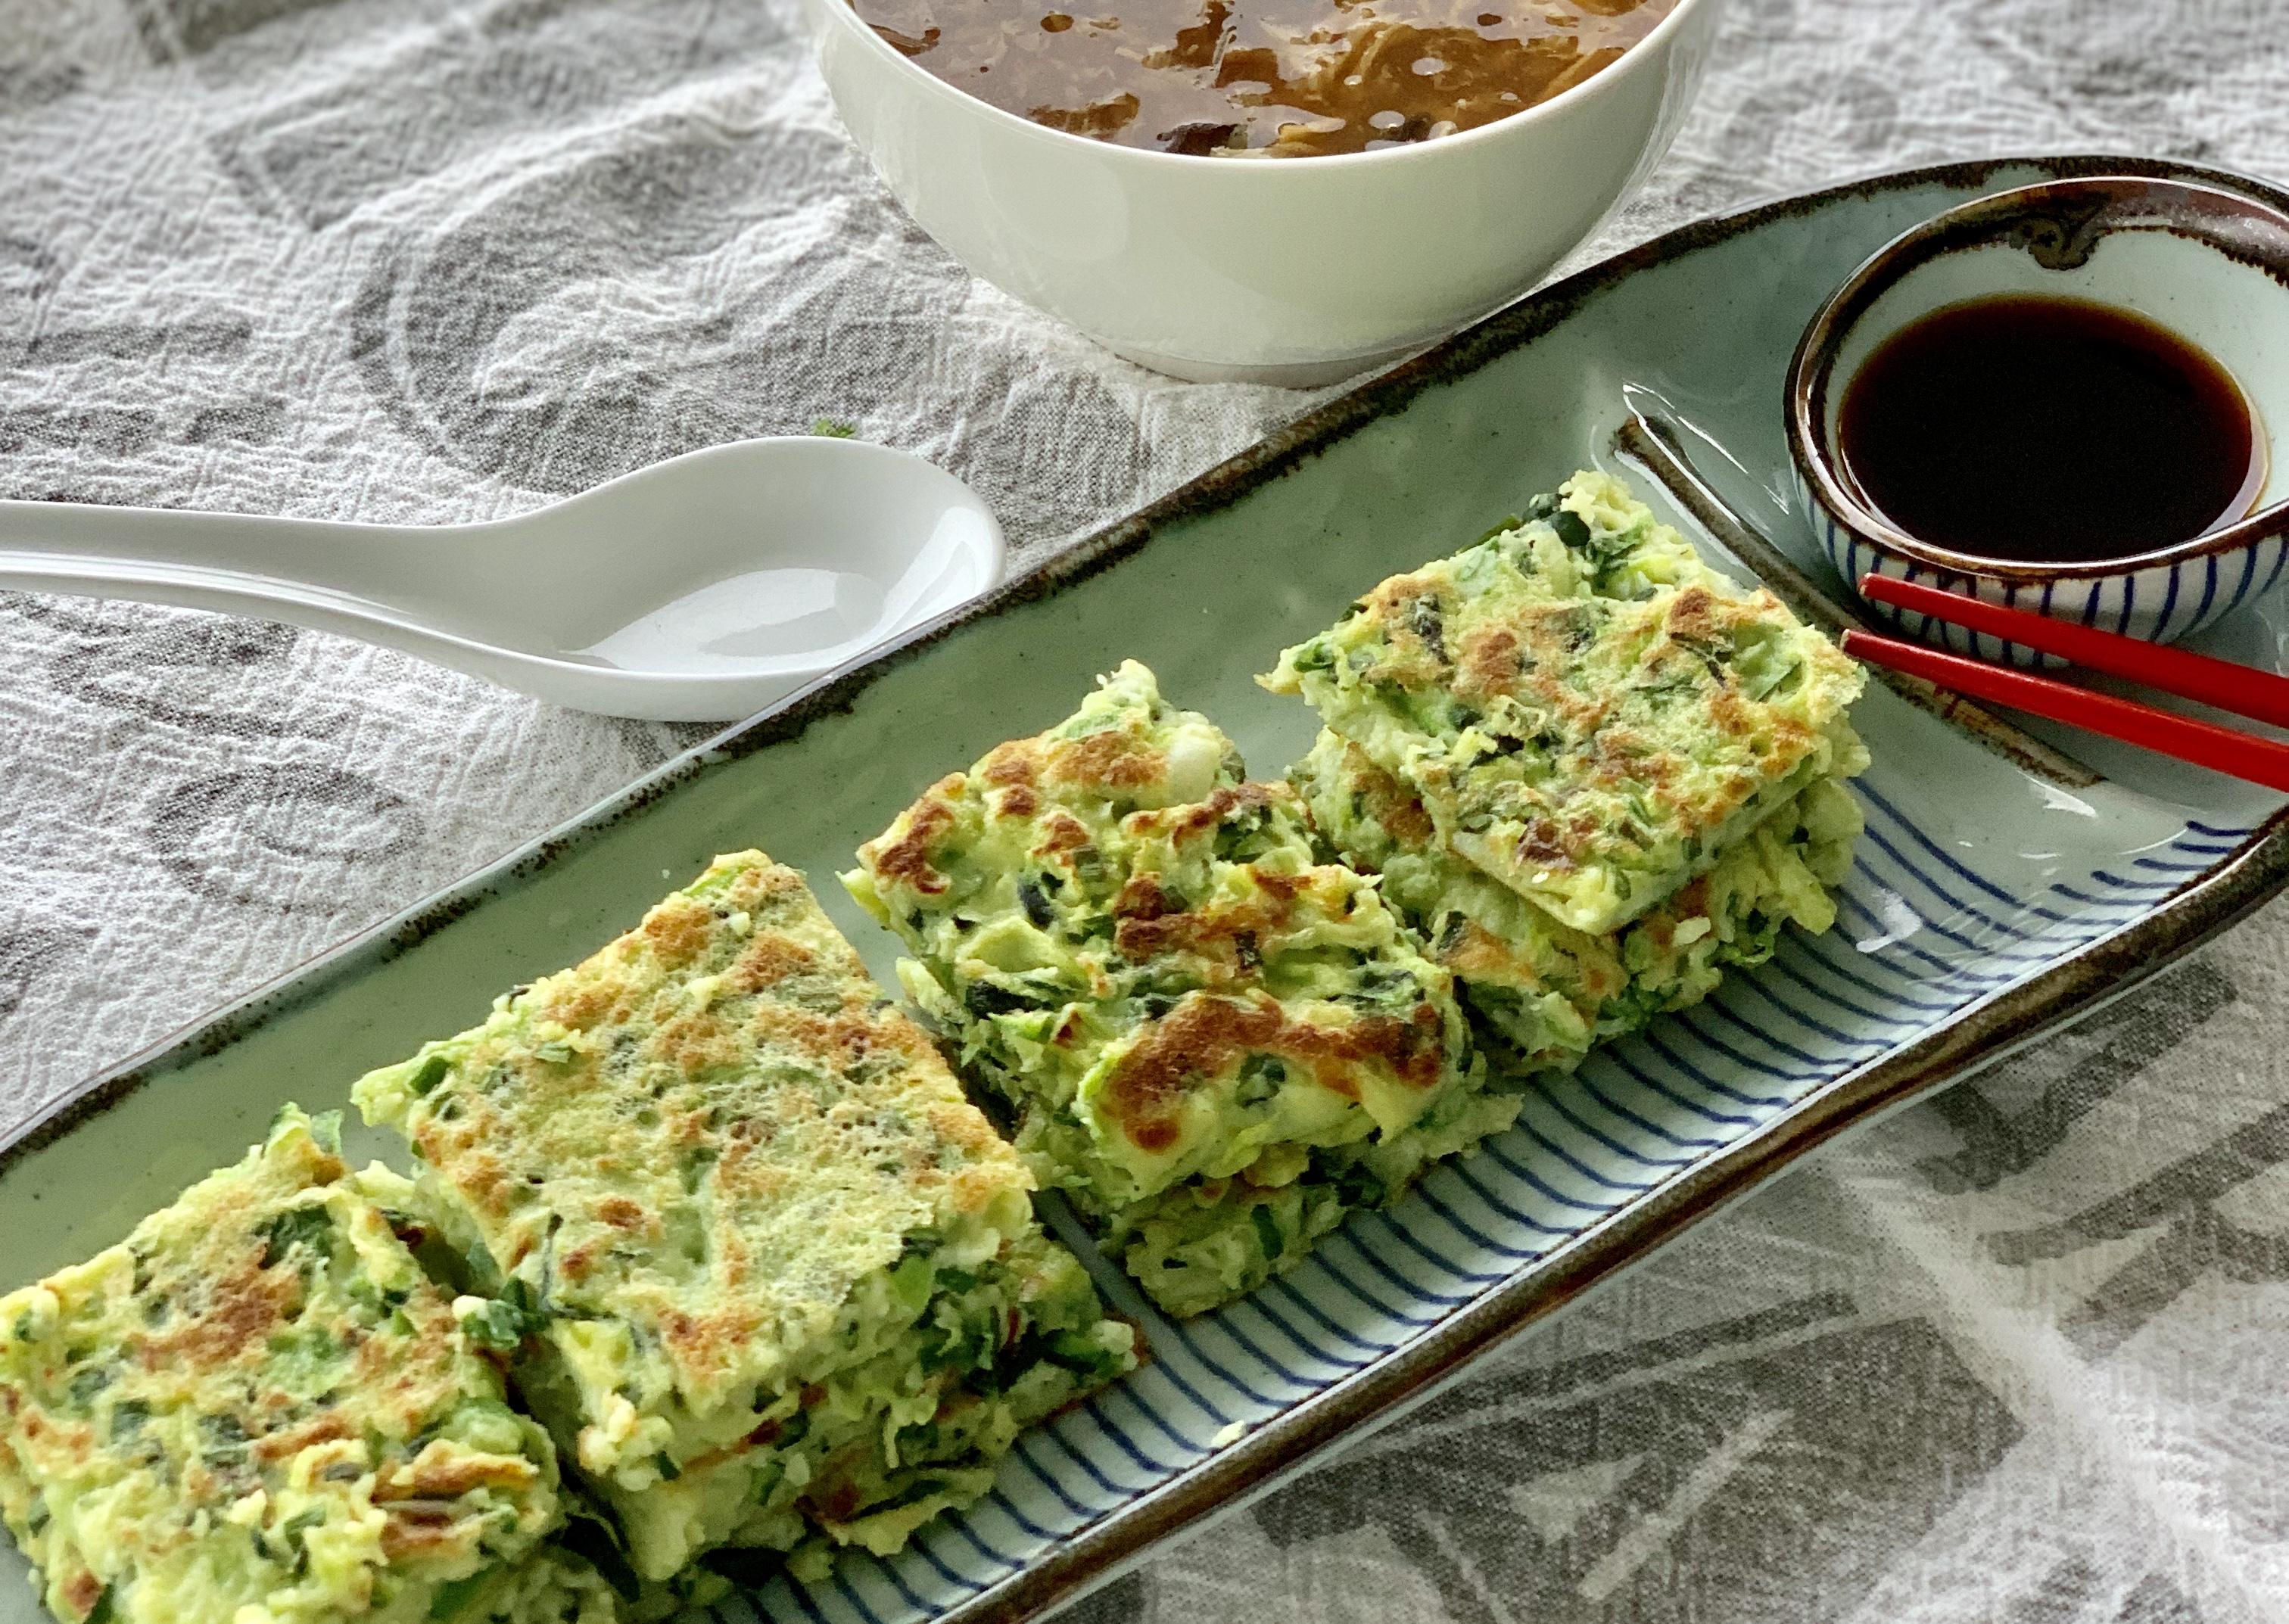 Chinese Zucchini Pancakes糊塌子hú tā zǐ